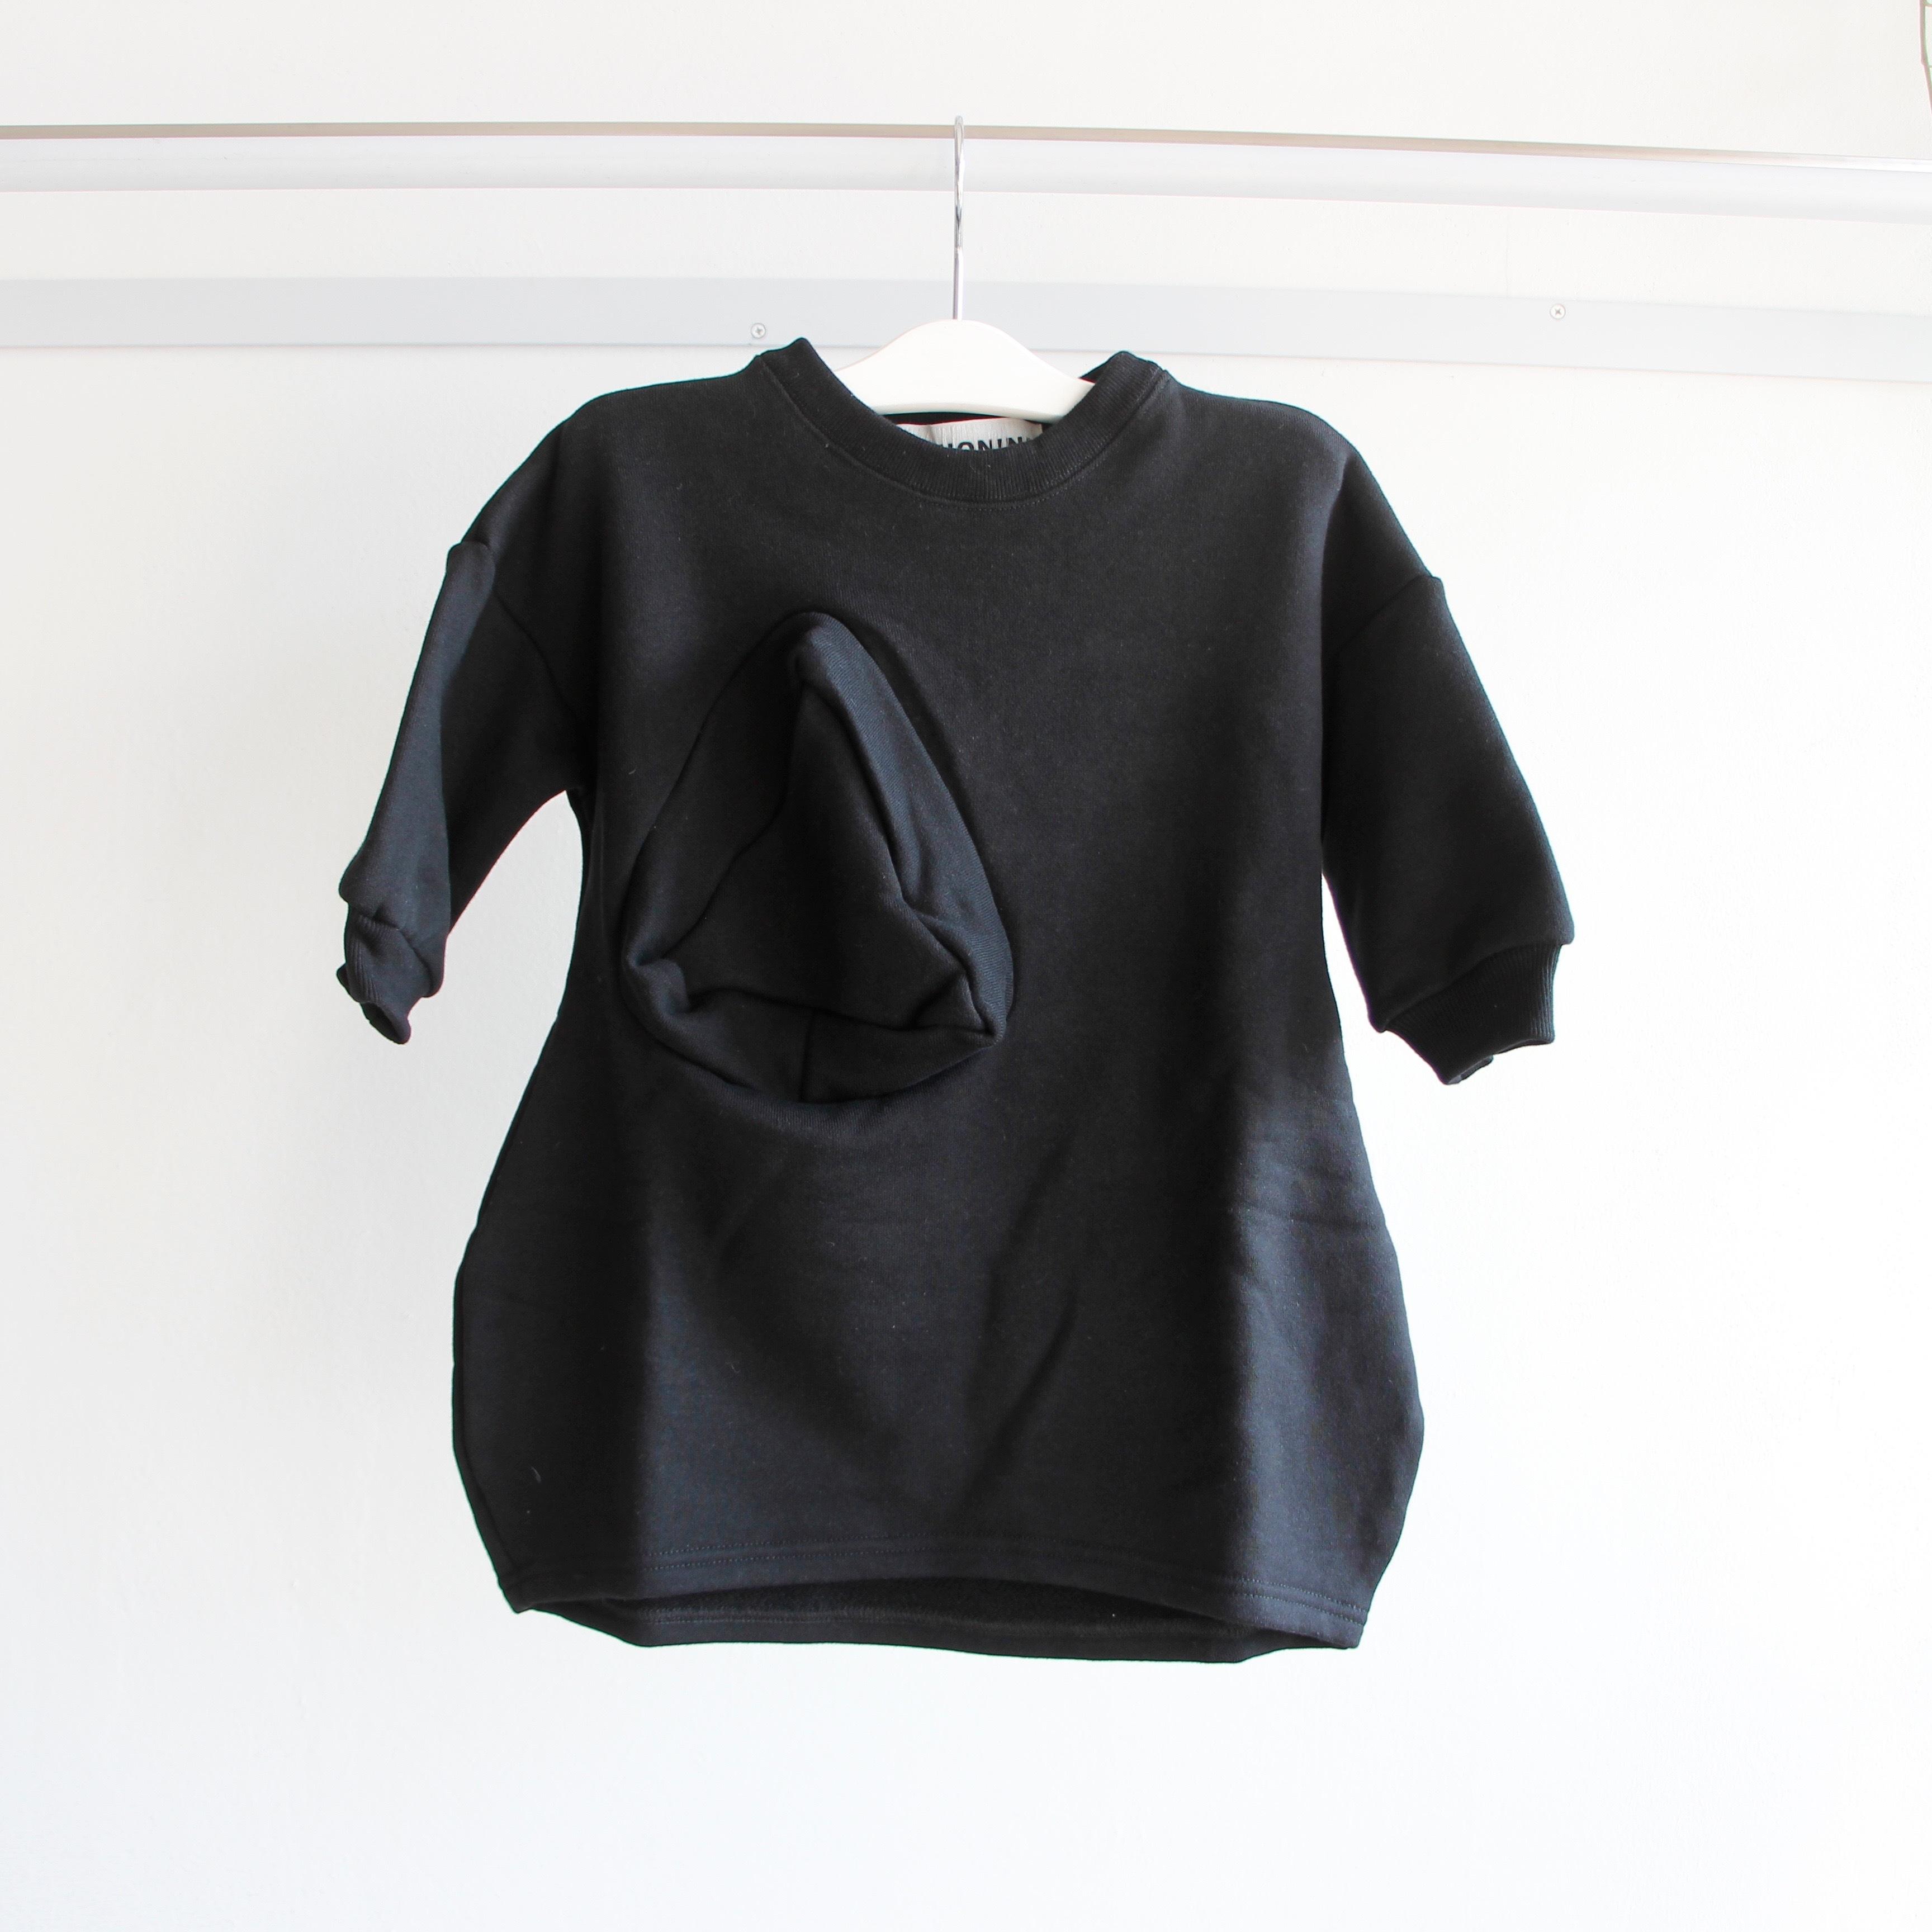 《UNIONINI 2019AW》◯△ sweat long dress / black / 1-10Y